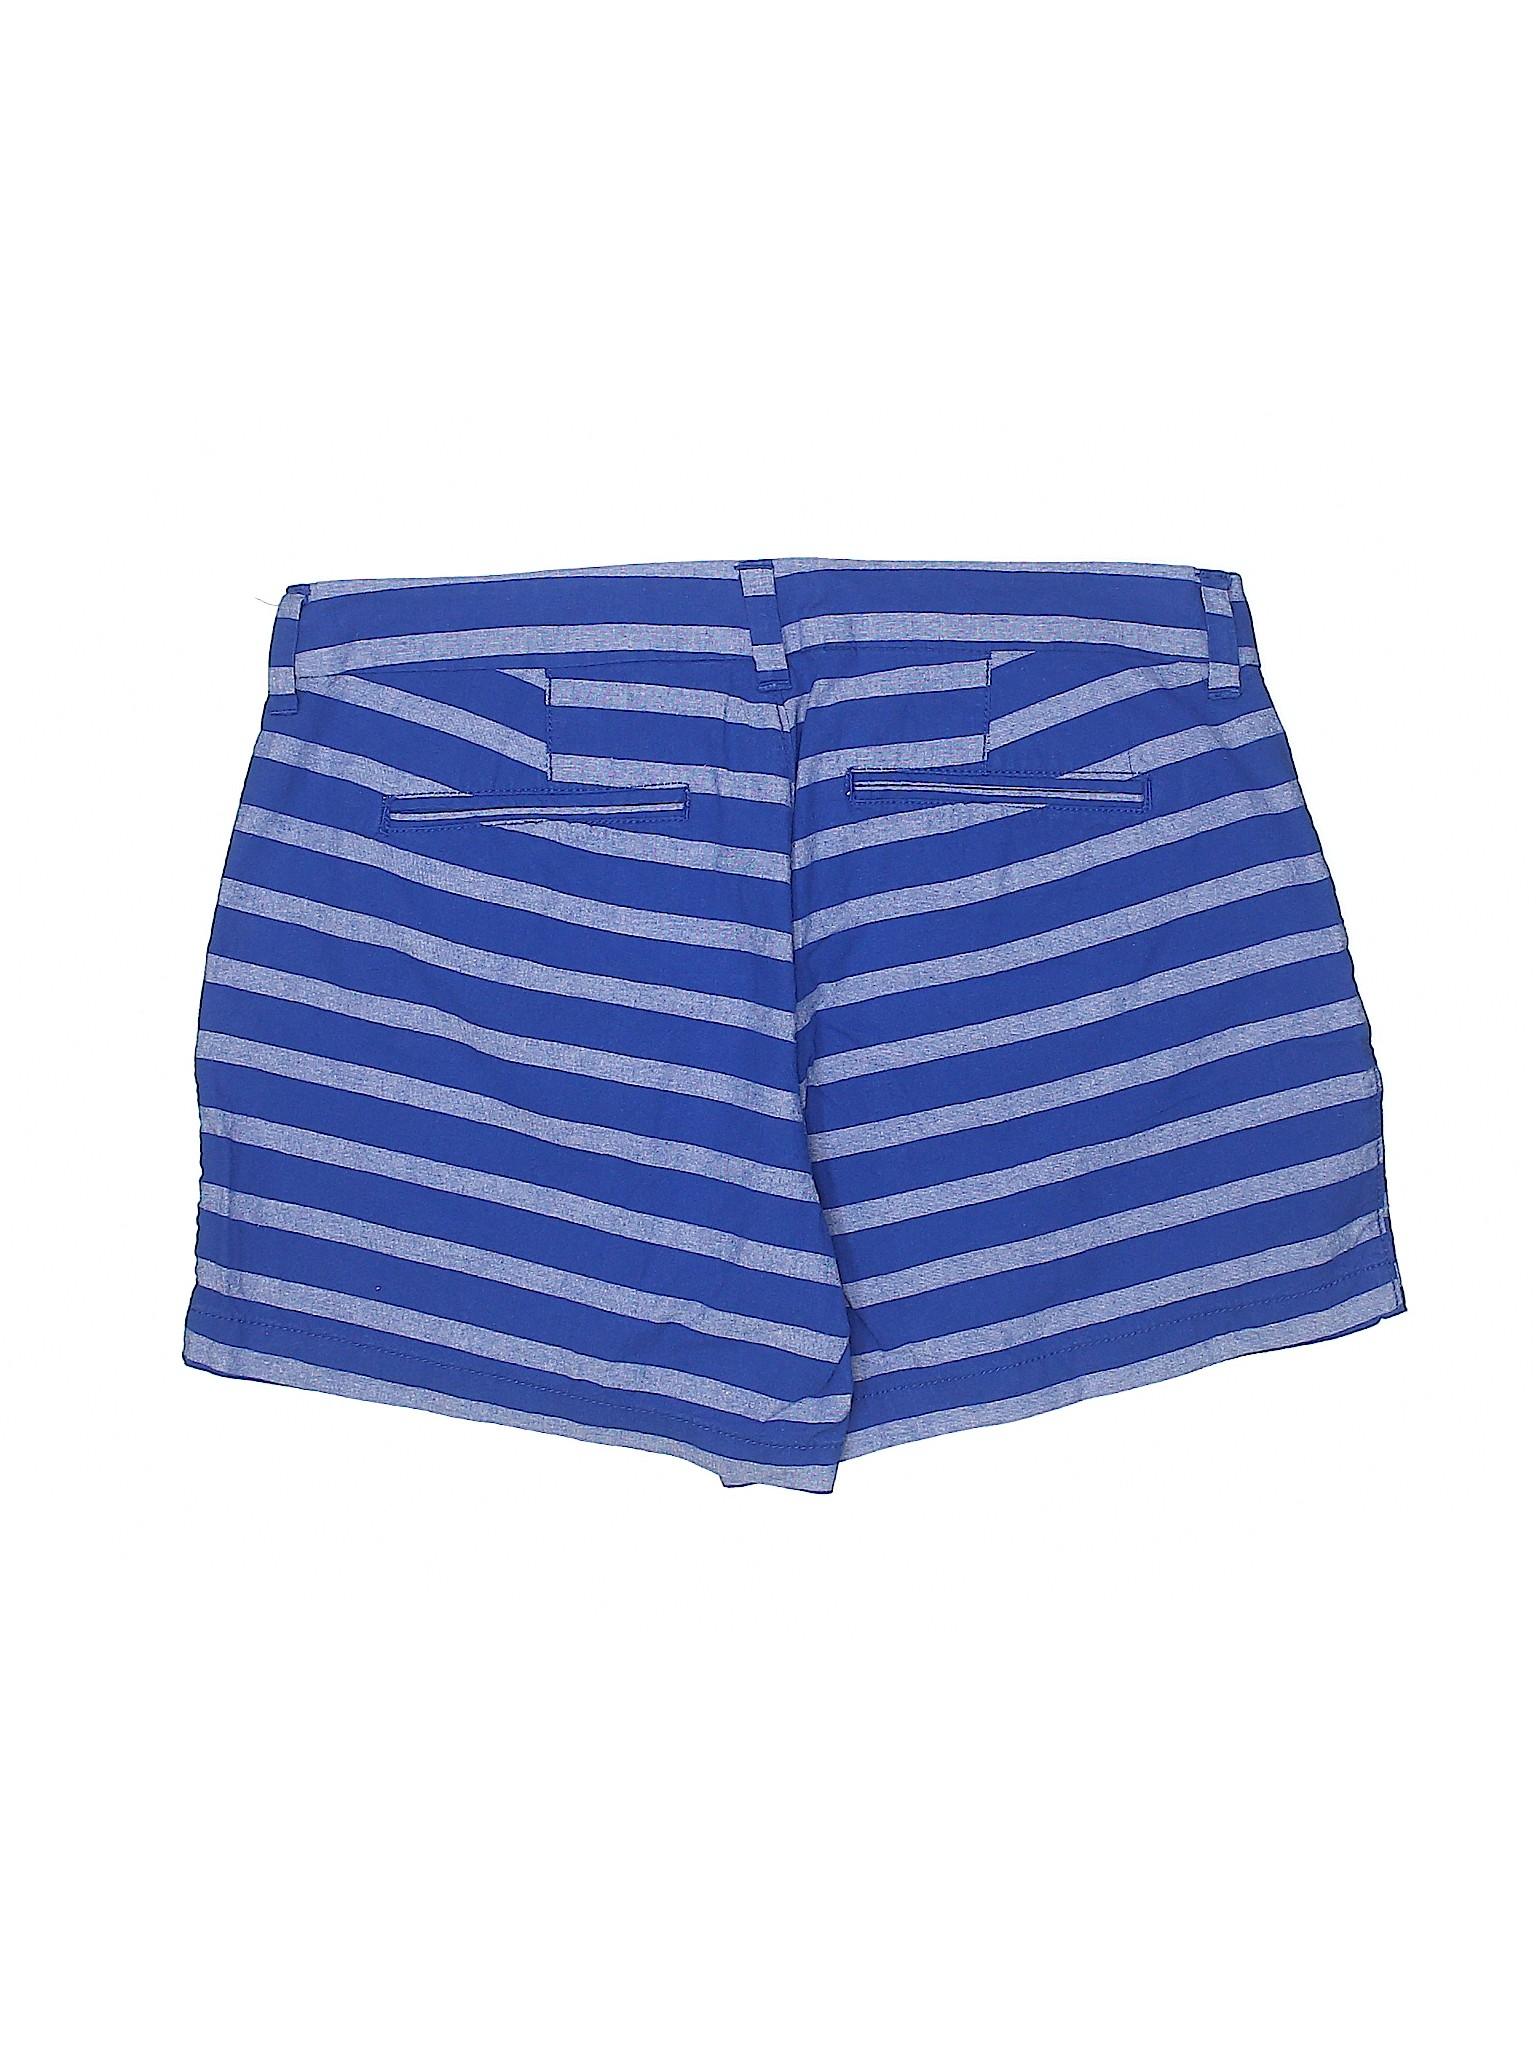 Shorts Boutique Old Boutique Navy Navy Old Shorts Boutique 07d7wTq